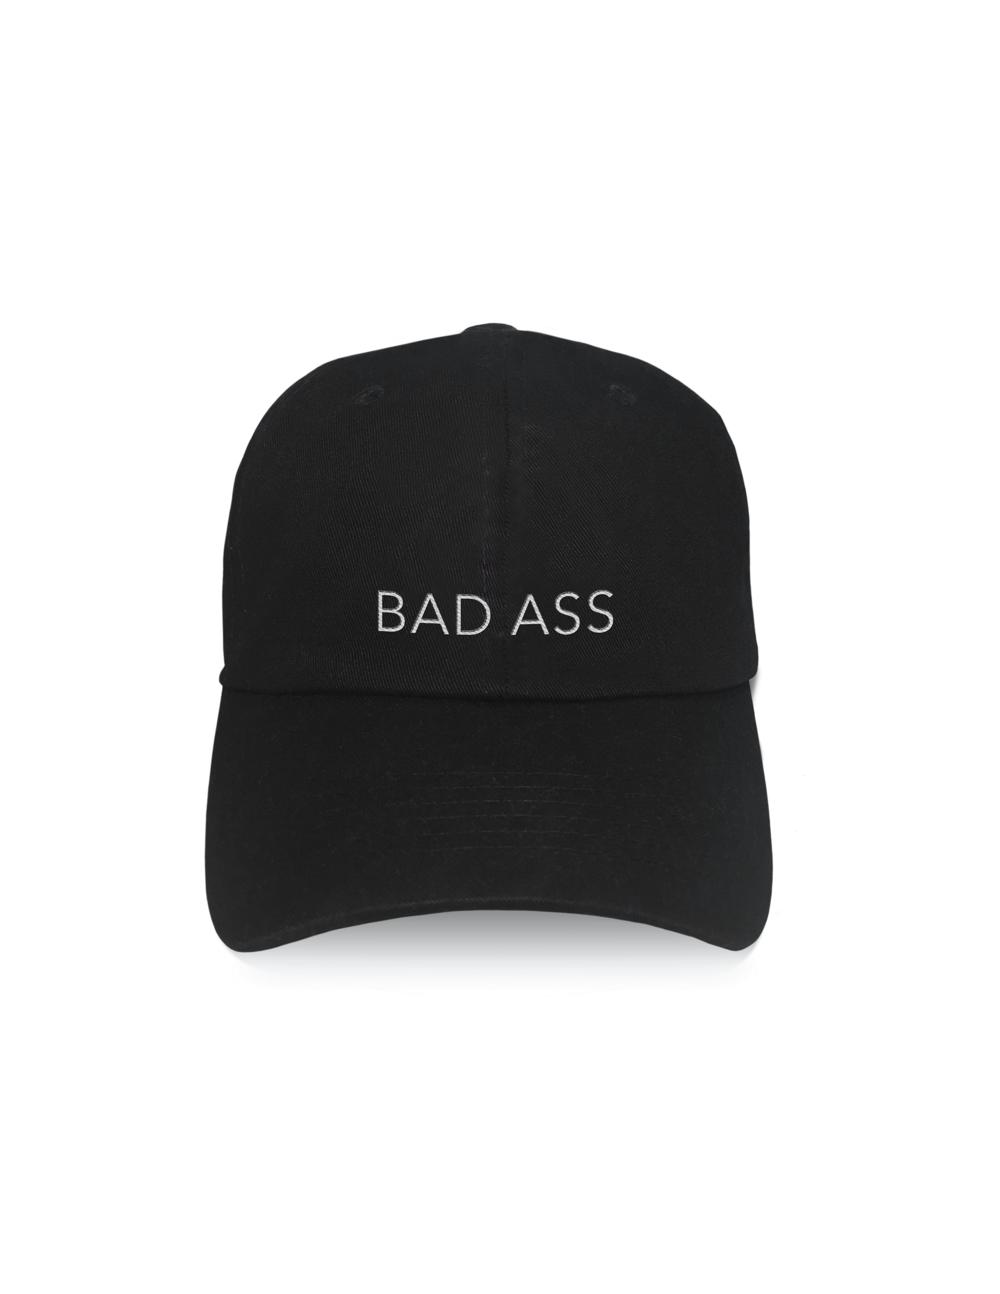 LA Trading Company Bad Ass Black Baseball Hat